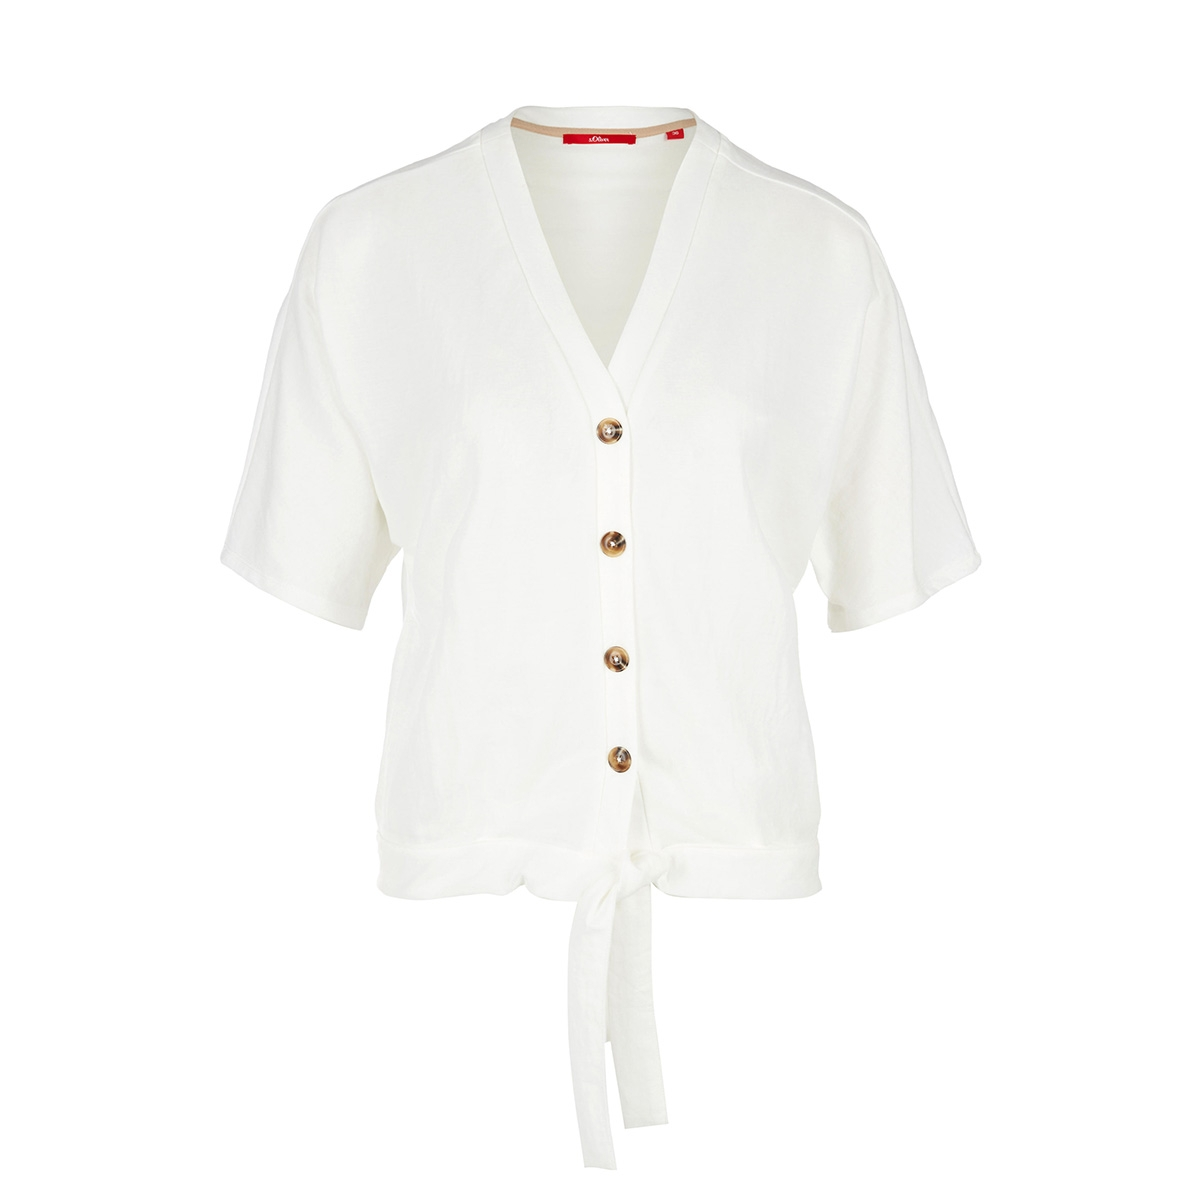 t shirt 14004324968 s.oliver t-shirt 0210